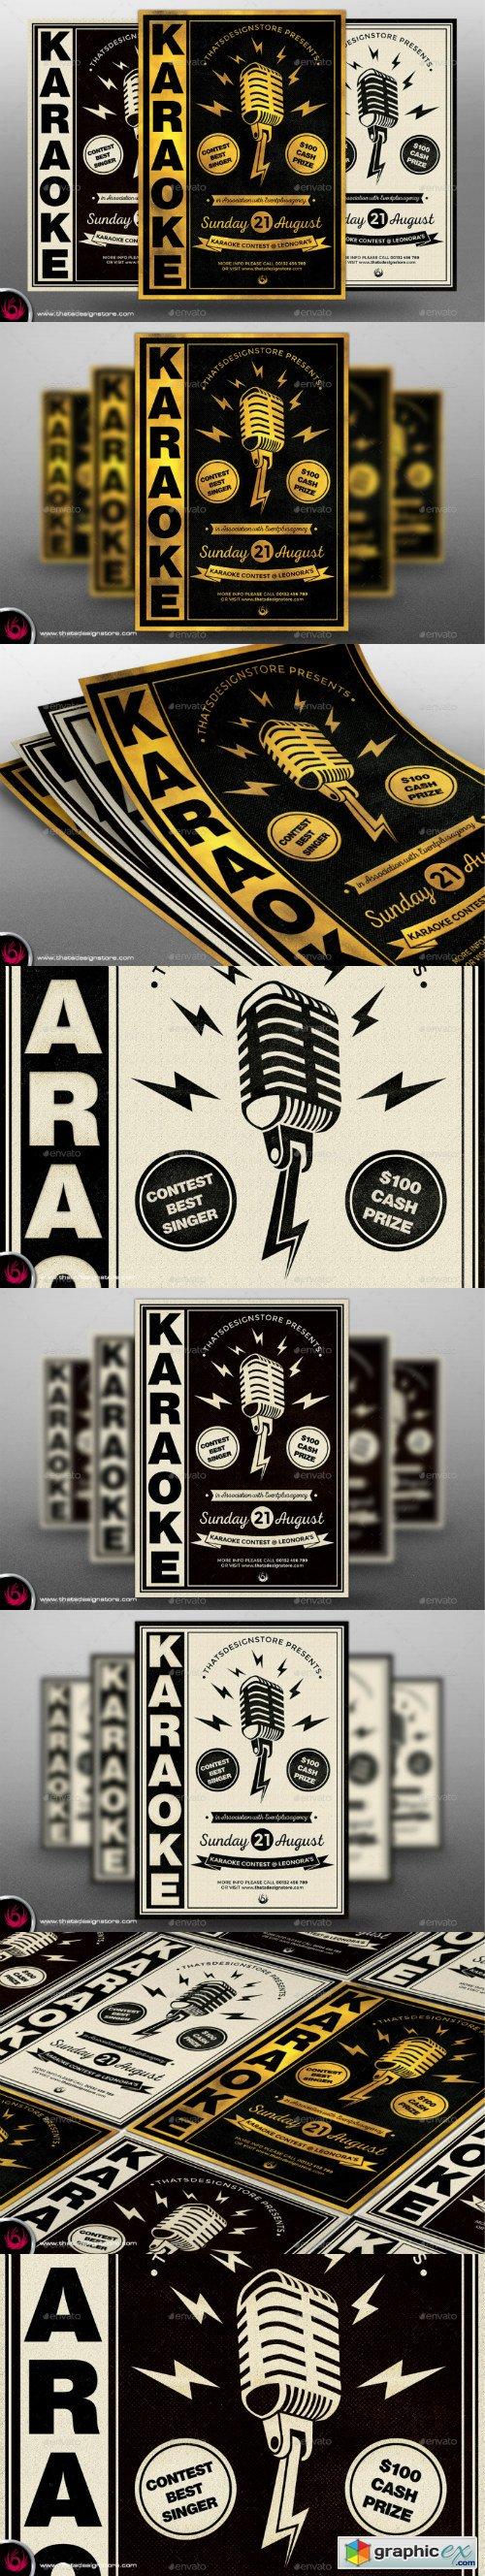 Karaoke Flyer Template V3 Free Download Vector Stock Image